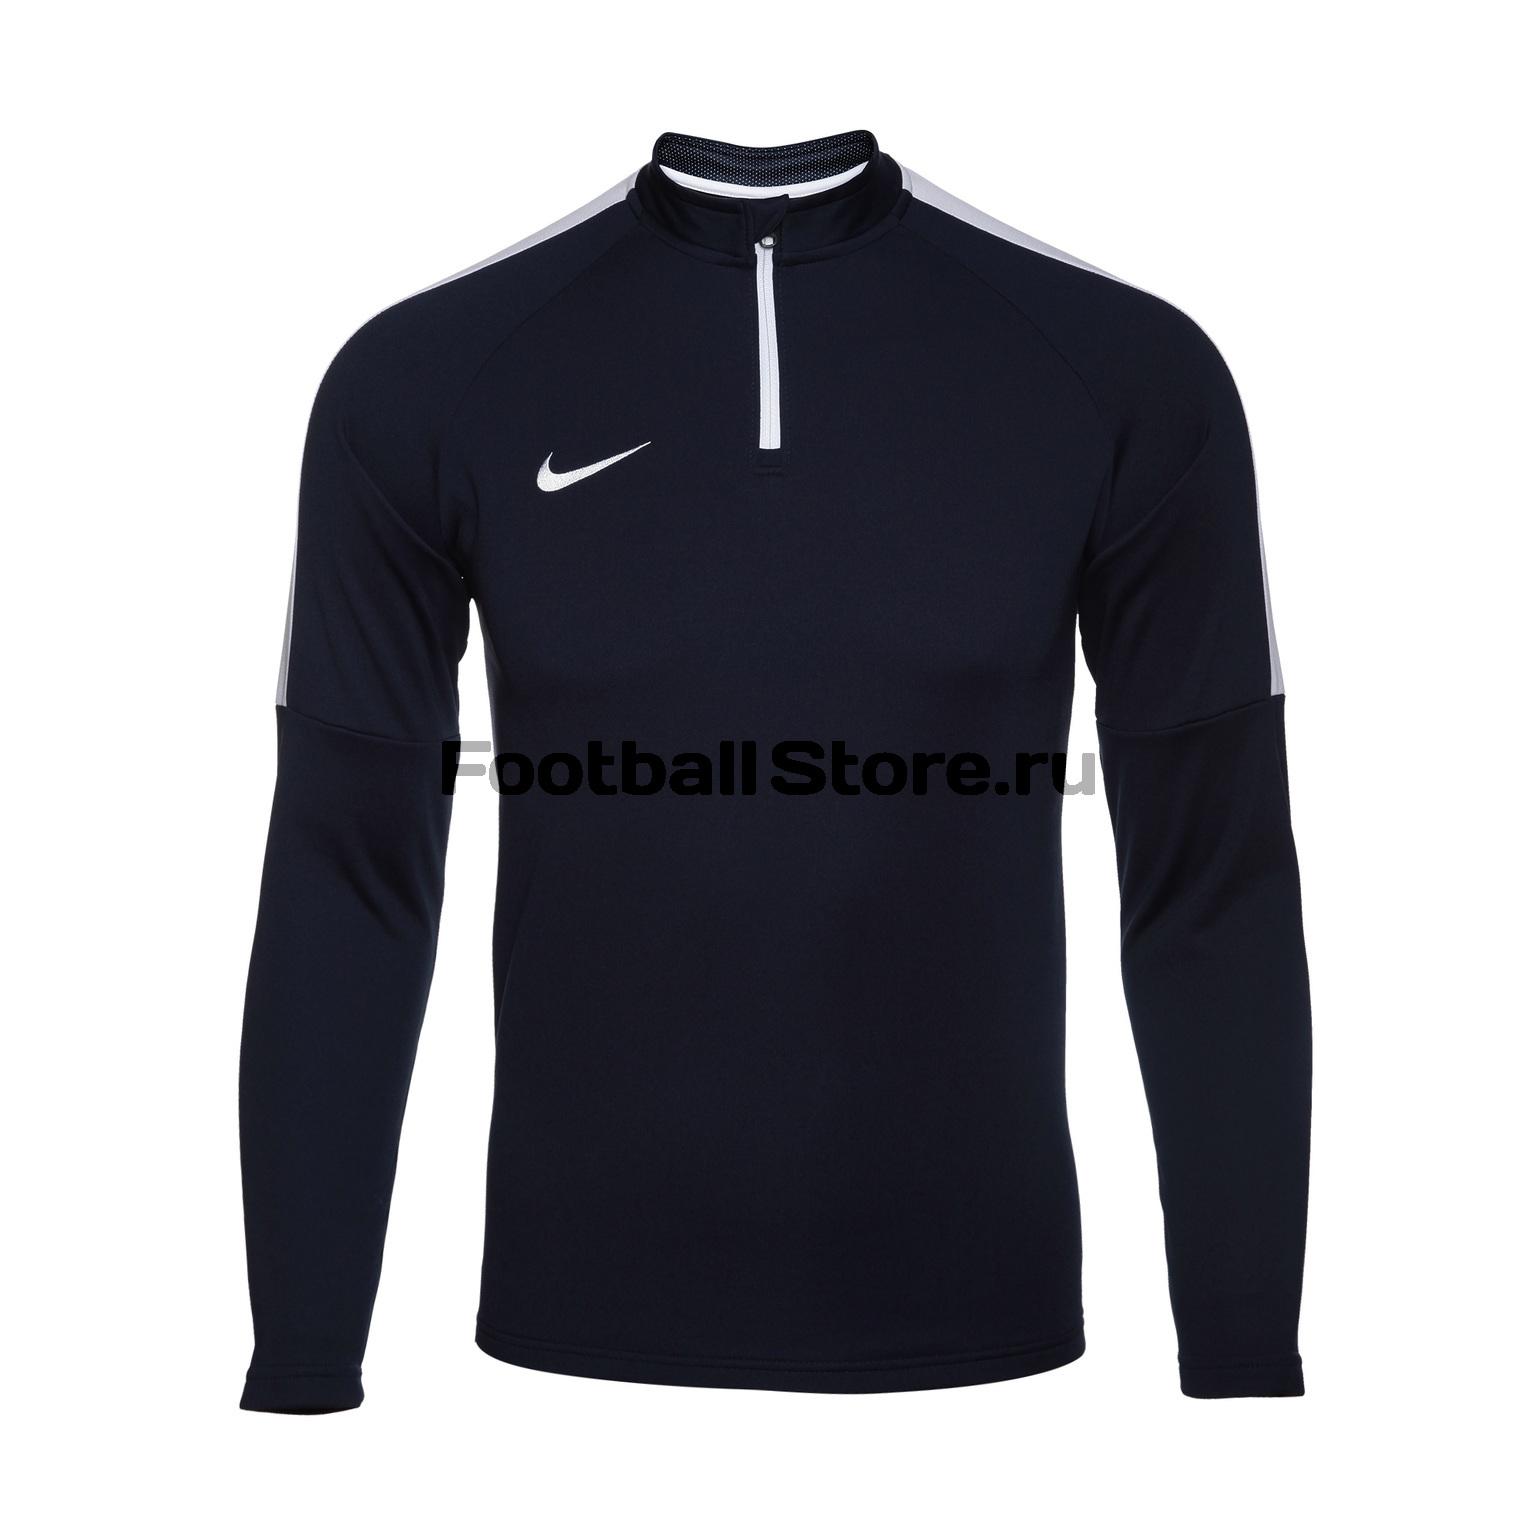 Свитер тренировочный Nike Boys Dril ACDMY Top 839358-451 свитера толстовки nike свитер тренировочный nike shld sqd dril top 888123 481